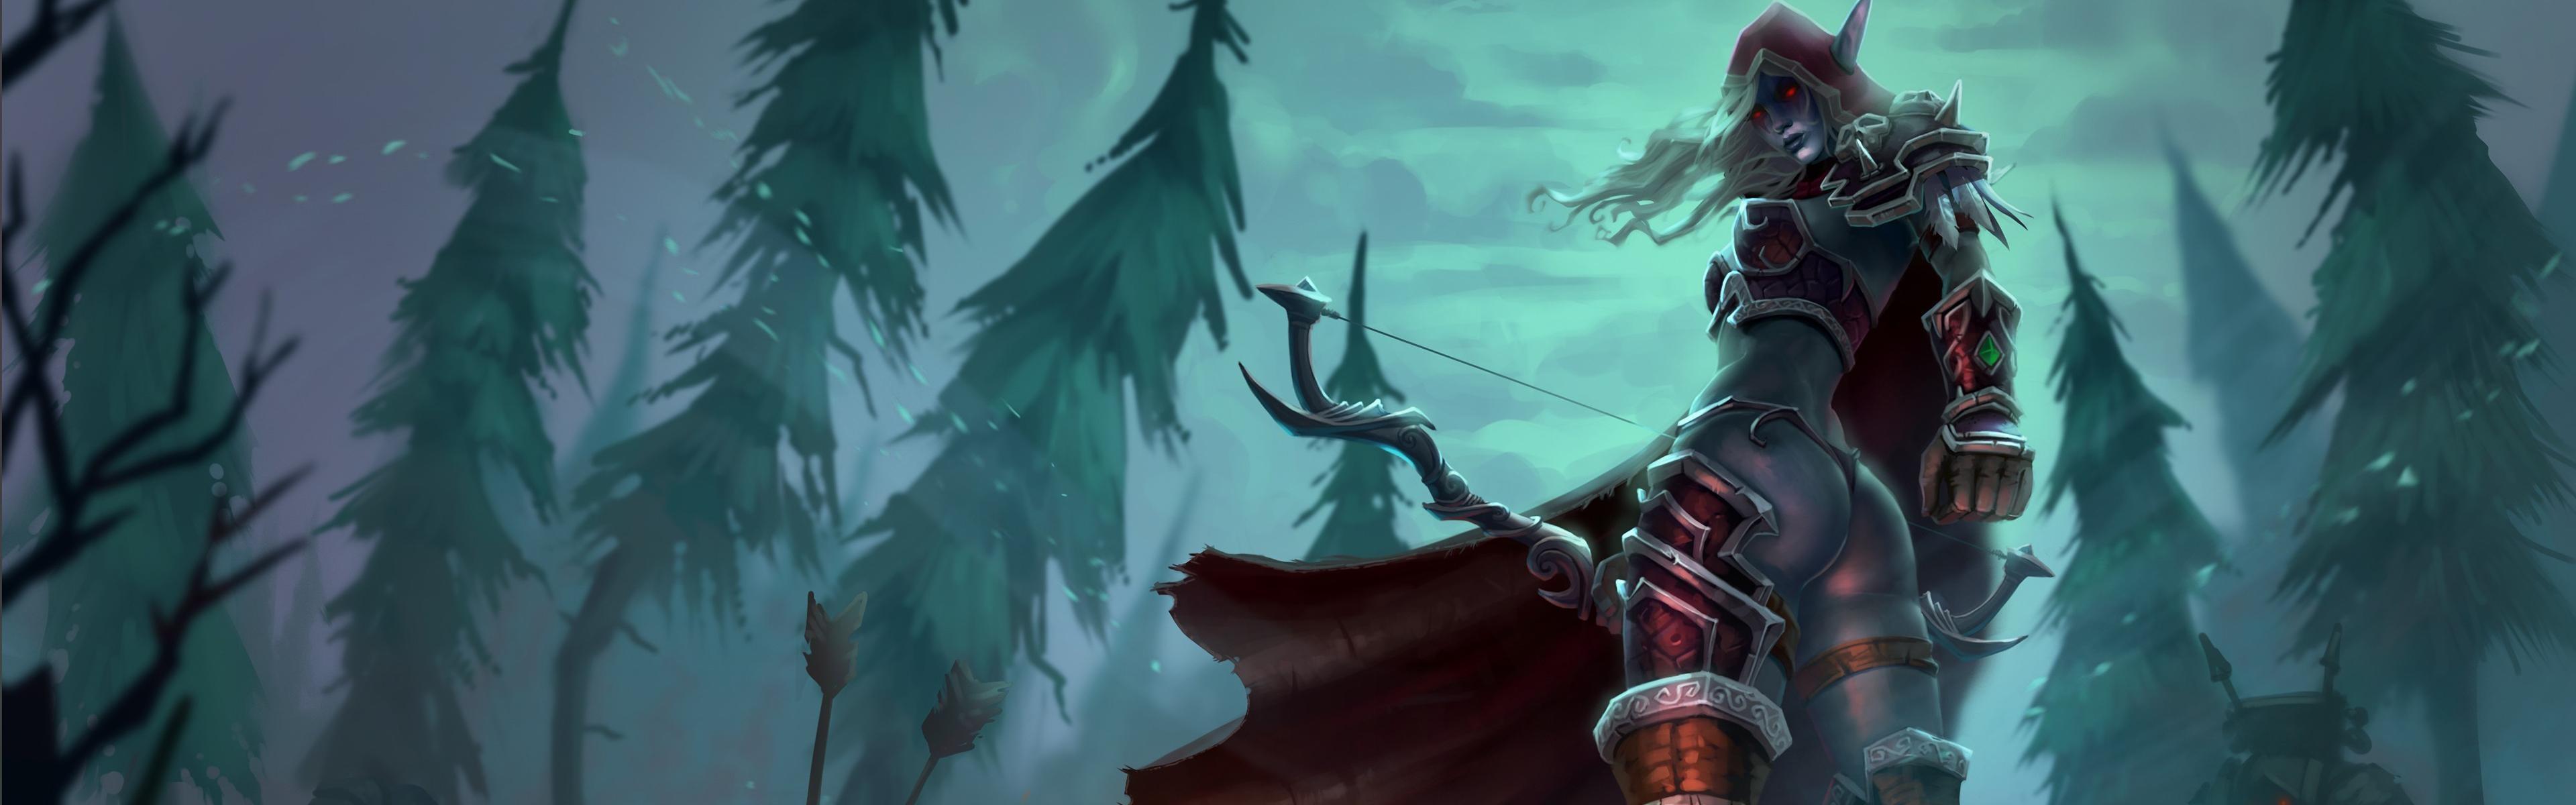 World Of Warcraft Dual Monitor Wallpaper